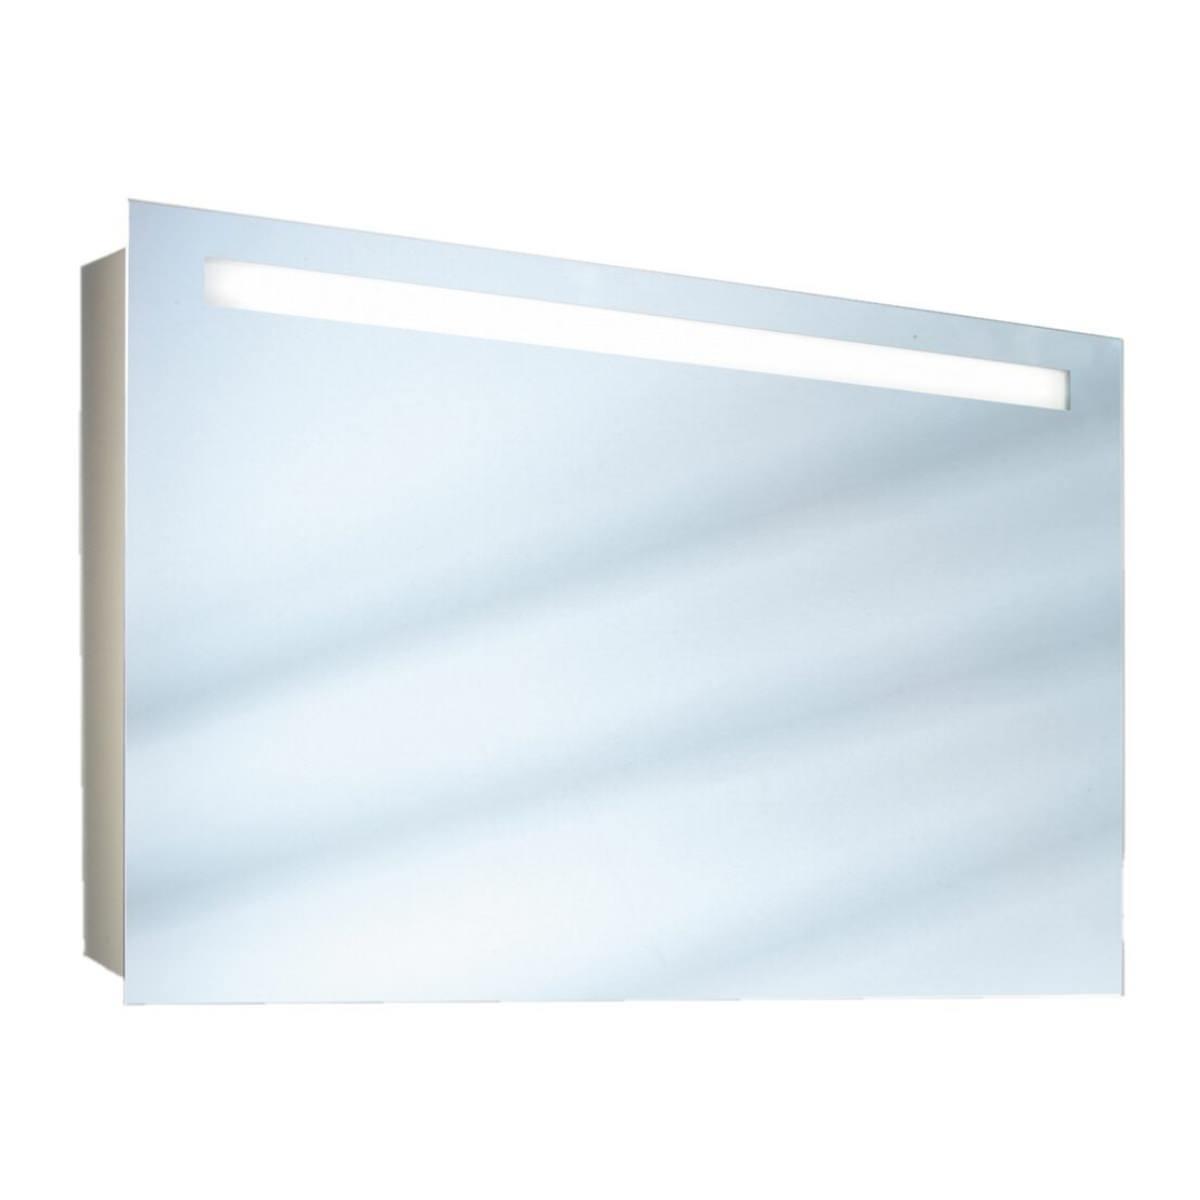 Schneider triline illuminated mirror 920mm for Illuminated mirrors